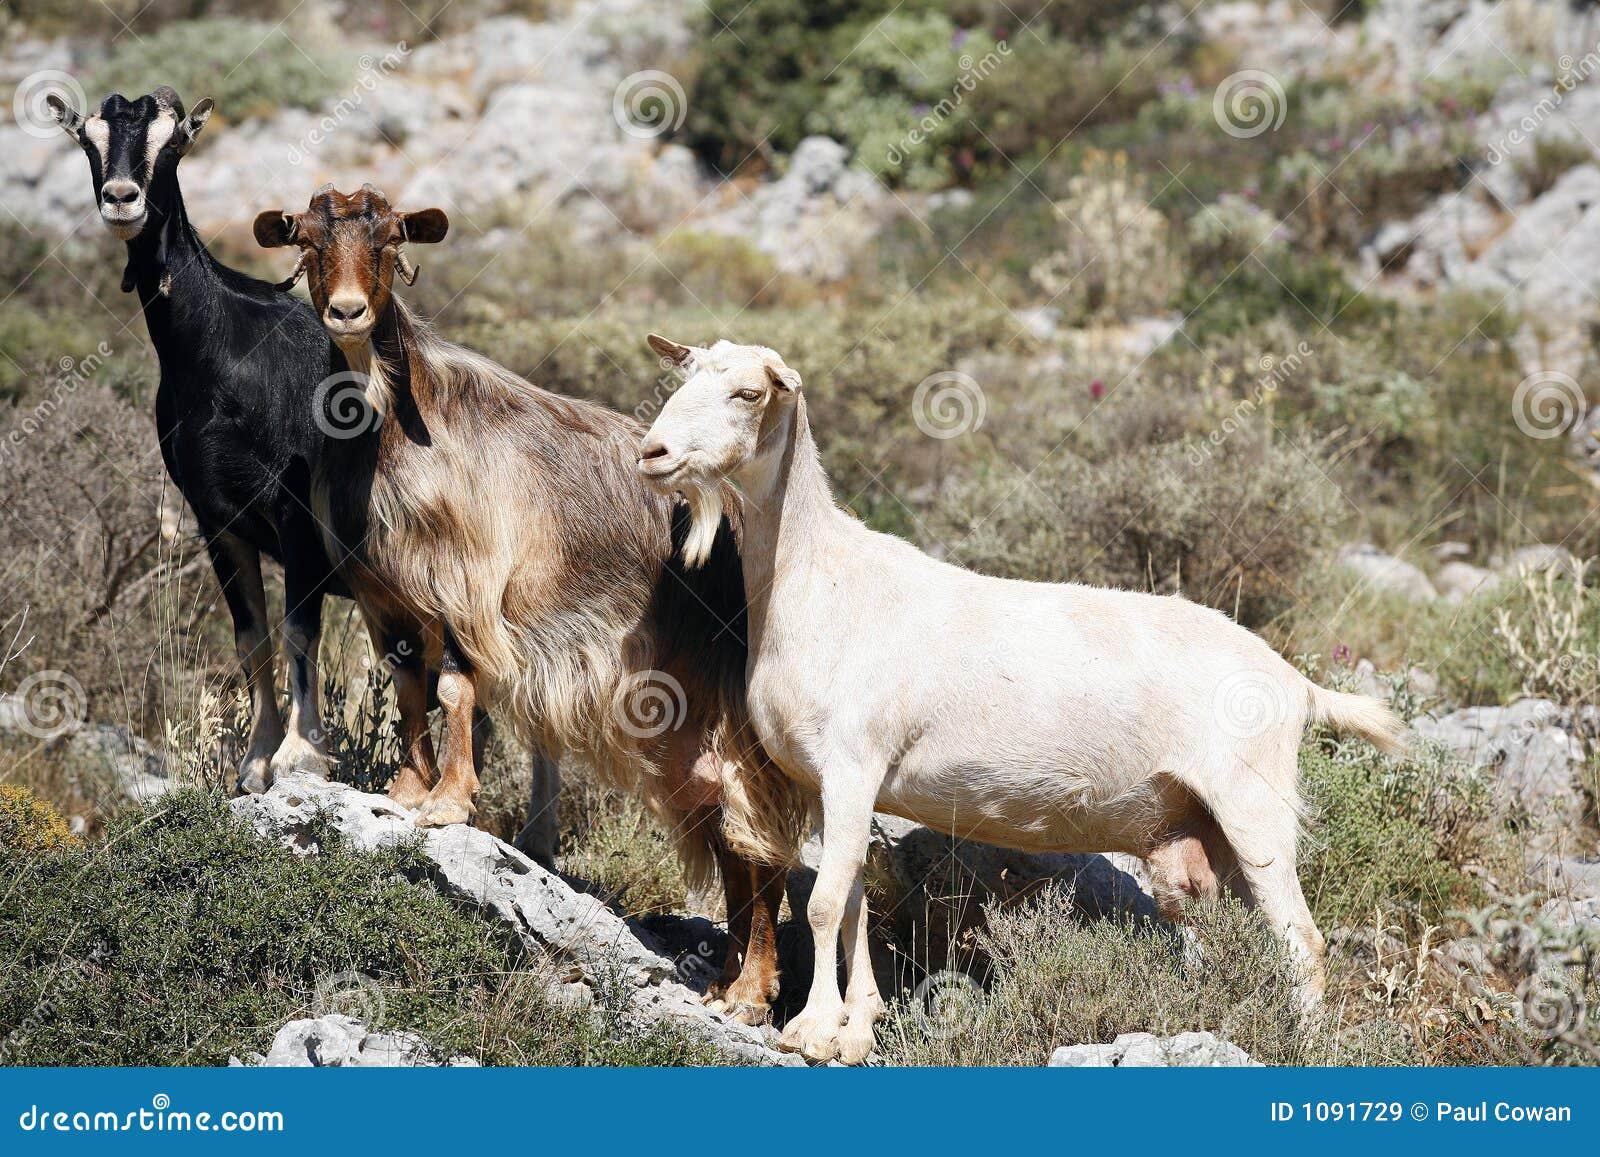 Capre di montagna immagine stock immagine di capra - Immagini da colorare capra ...